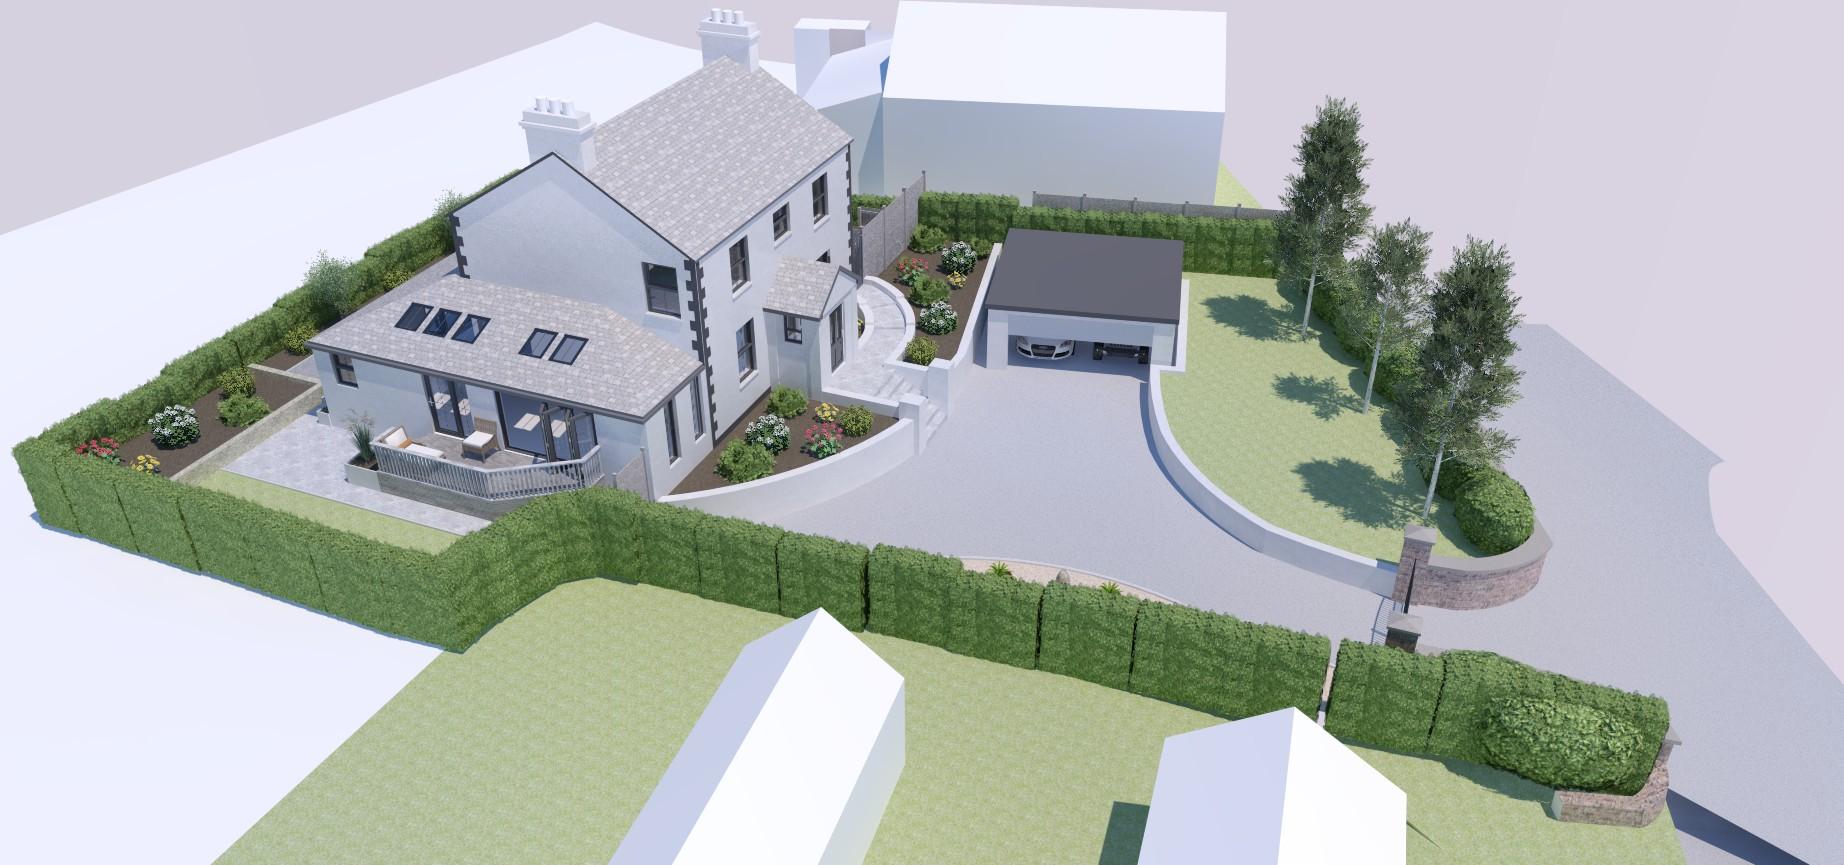 6 The Lydiate - Kerrys Cottage Planning Model Latest 2019-08-29 15192100000.jpg